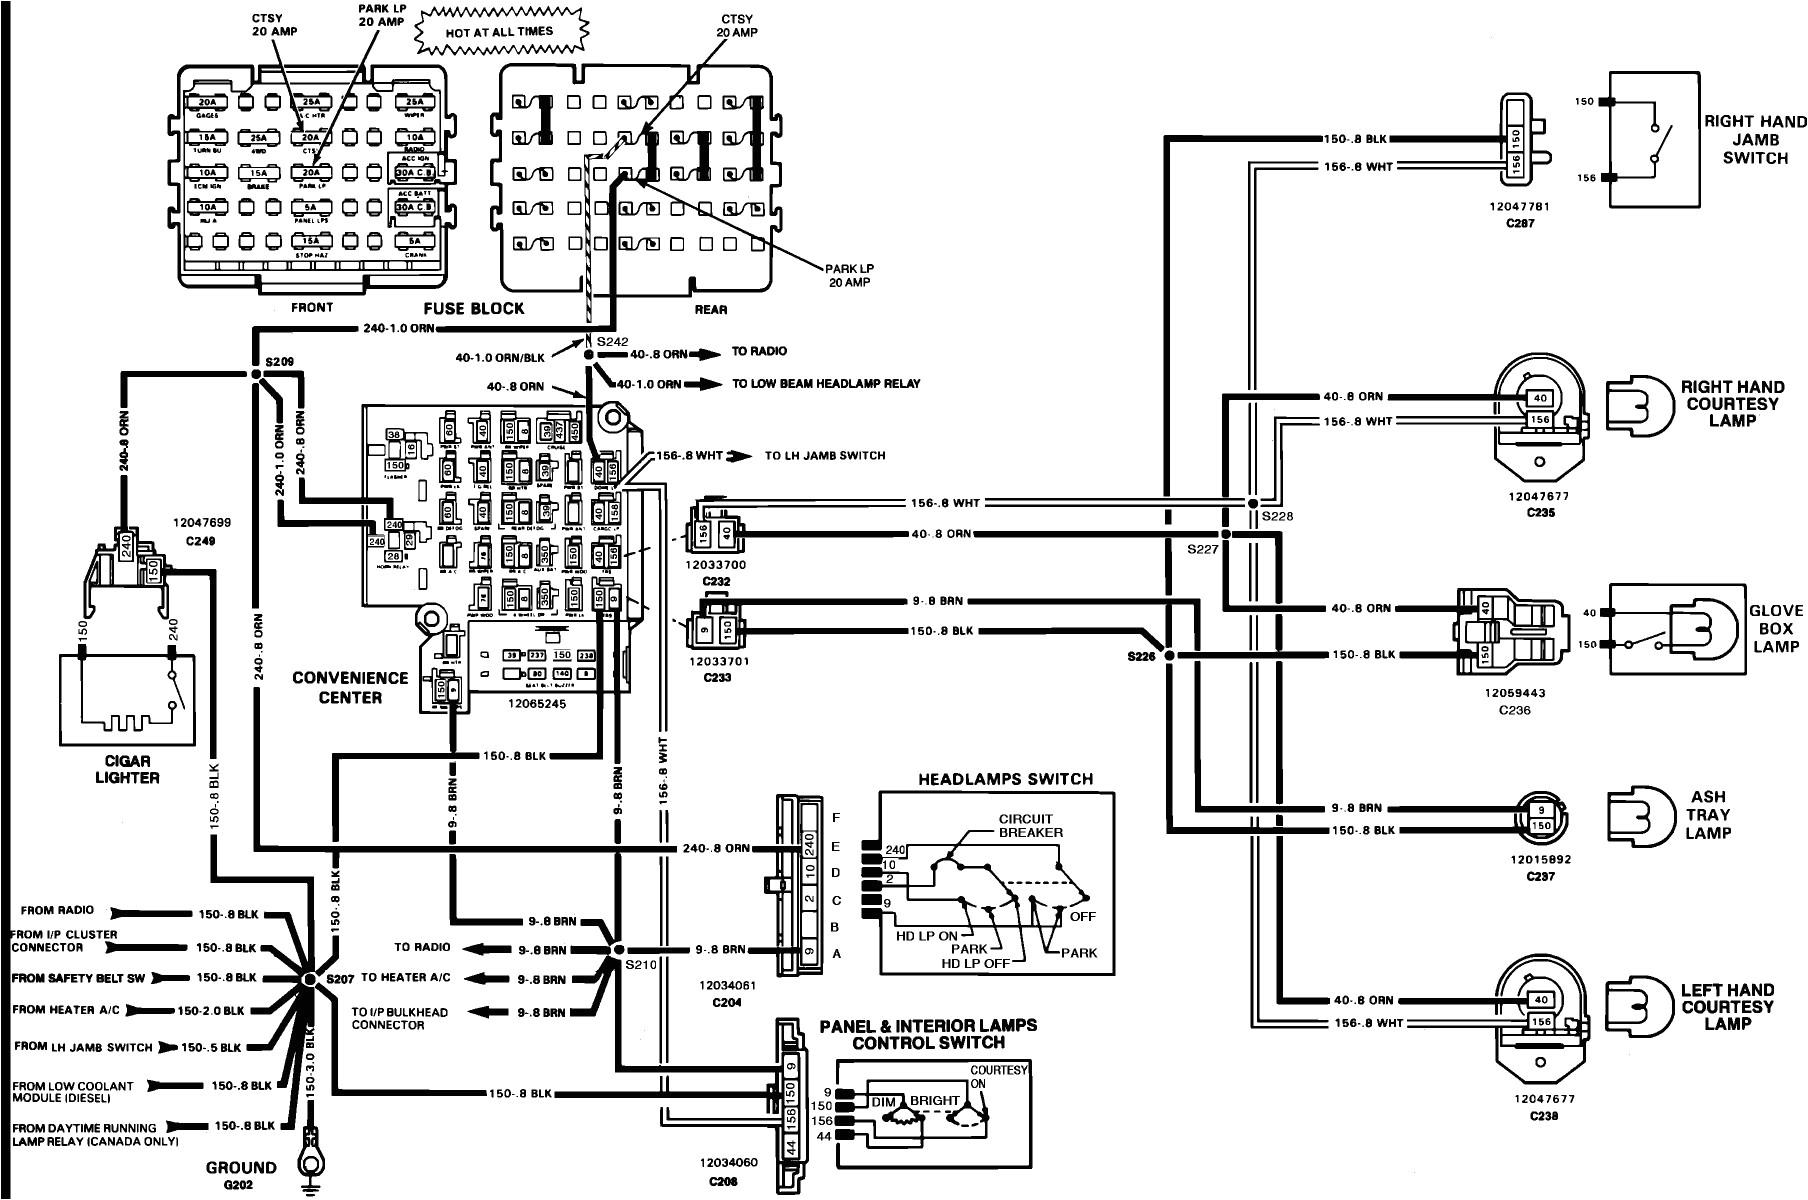 Chevrolet Joy Wiring Diagram - 2003 Oldsmobile Alero Wiring Diagram -  peugeotjetforce.cukk.jeanjaures37.fr | Chevrolet Joy Wiring Diagram |  | Wiring Diagram Resource